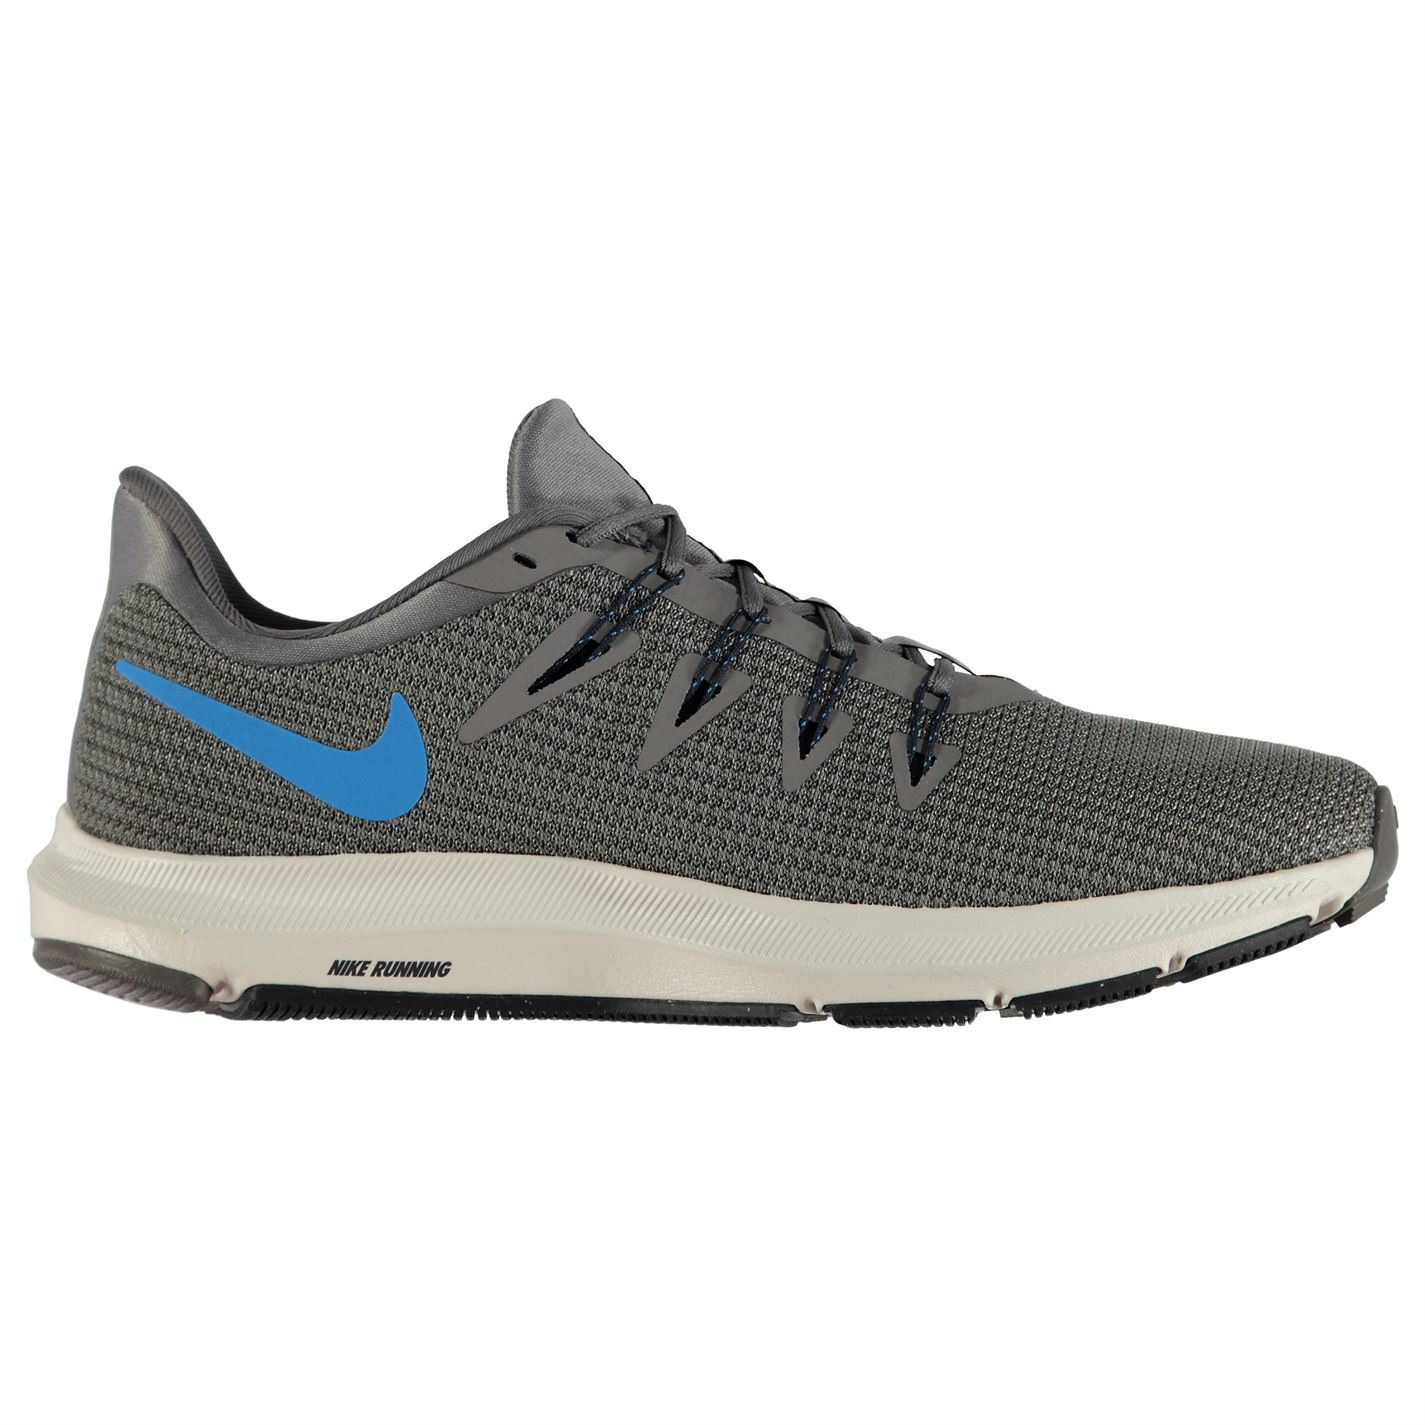 495ecf5ee Nike-Quest-Zapatillas-Running-Hombre-Fitness-Trote-Zapatillas miniatura